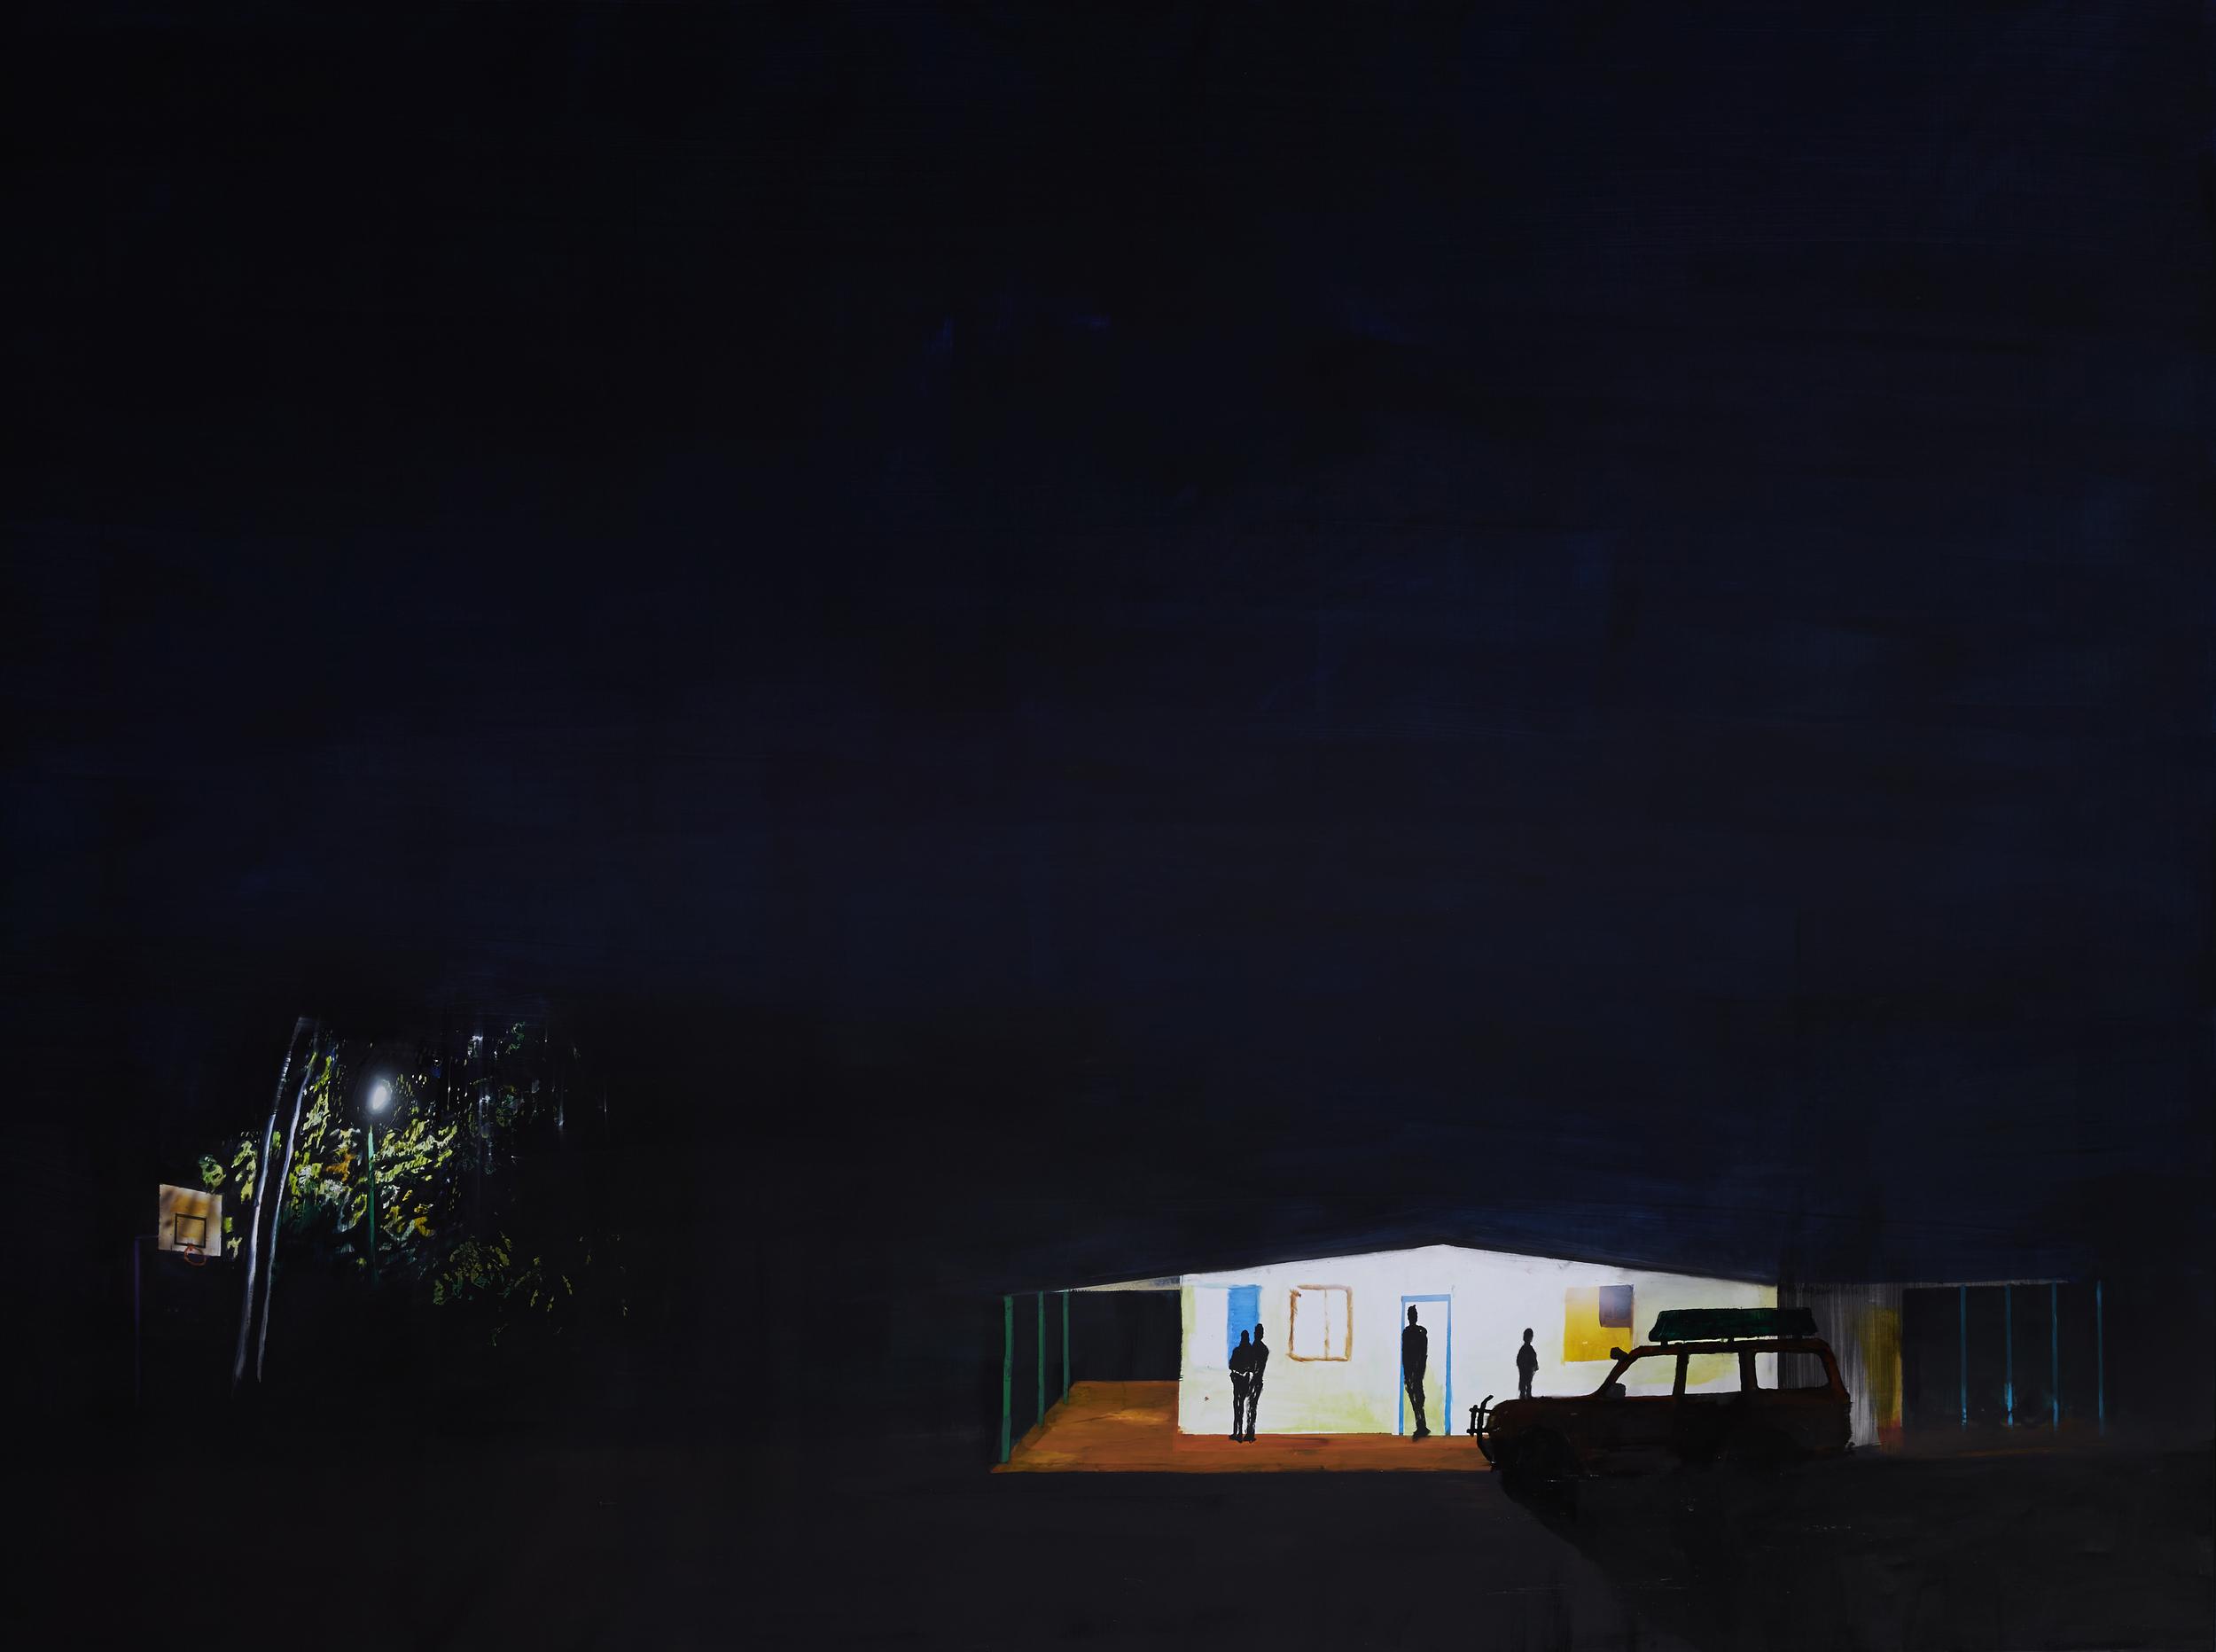 Australian Gothic/ Kintore Blues,  2015 Acrylic, oil and enamel on synthetic polymer canvas 50 x 200cm